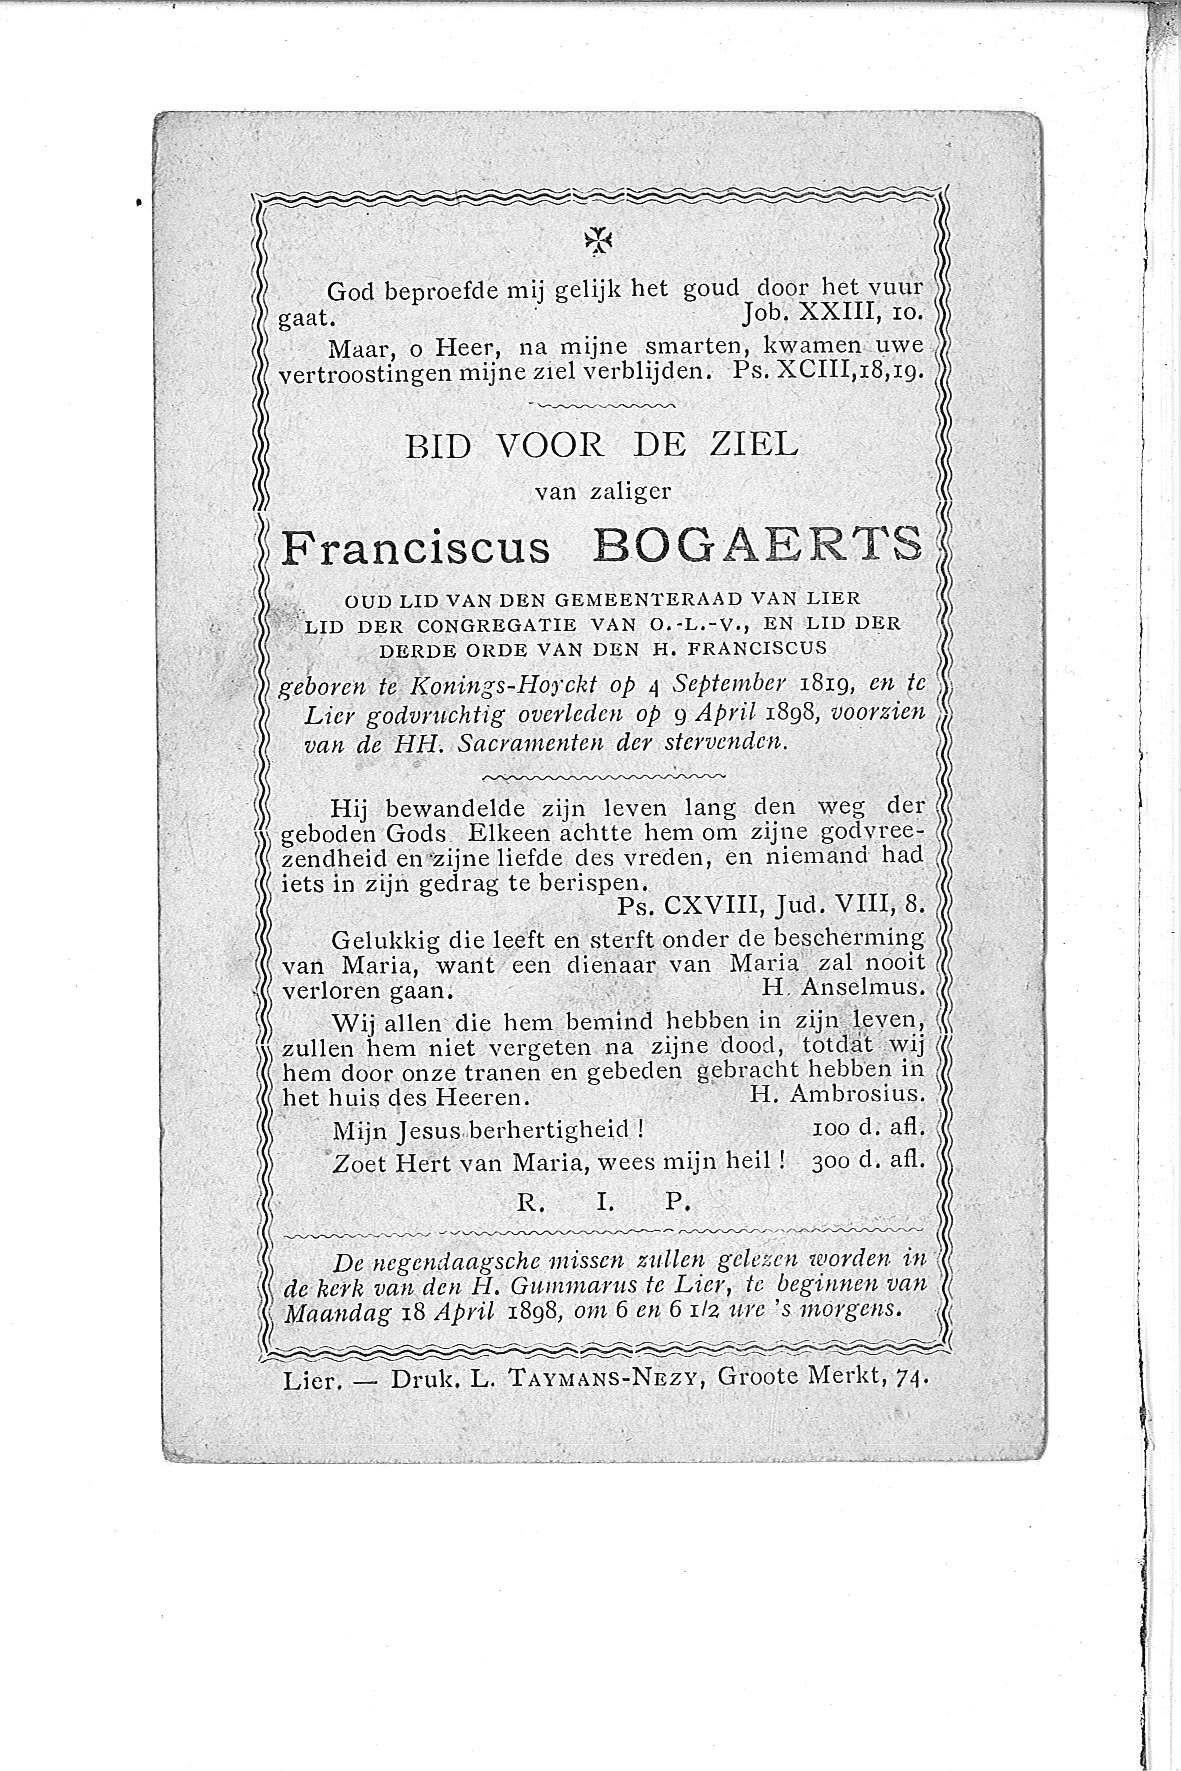 Franciscus(1898)20110318084748_00013.jpg